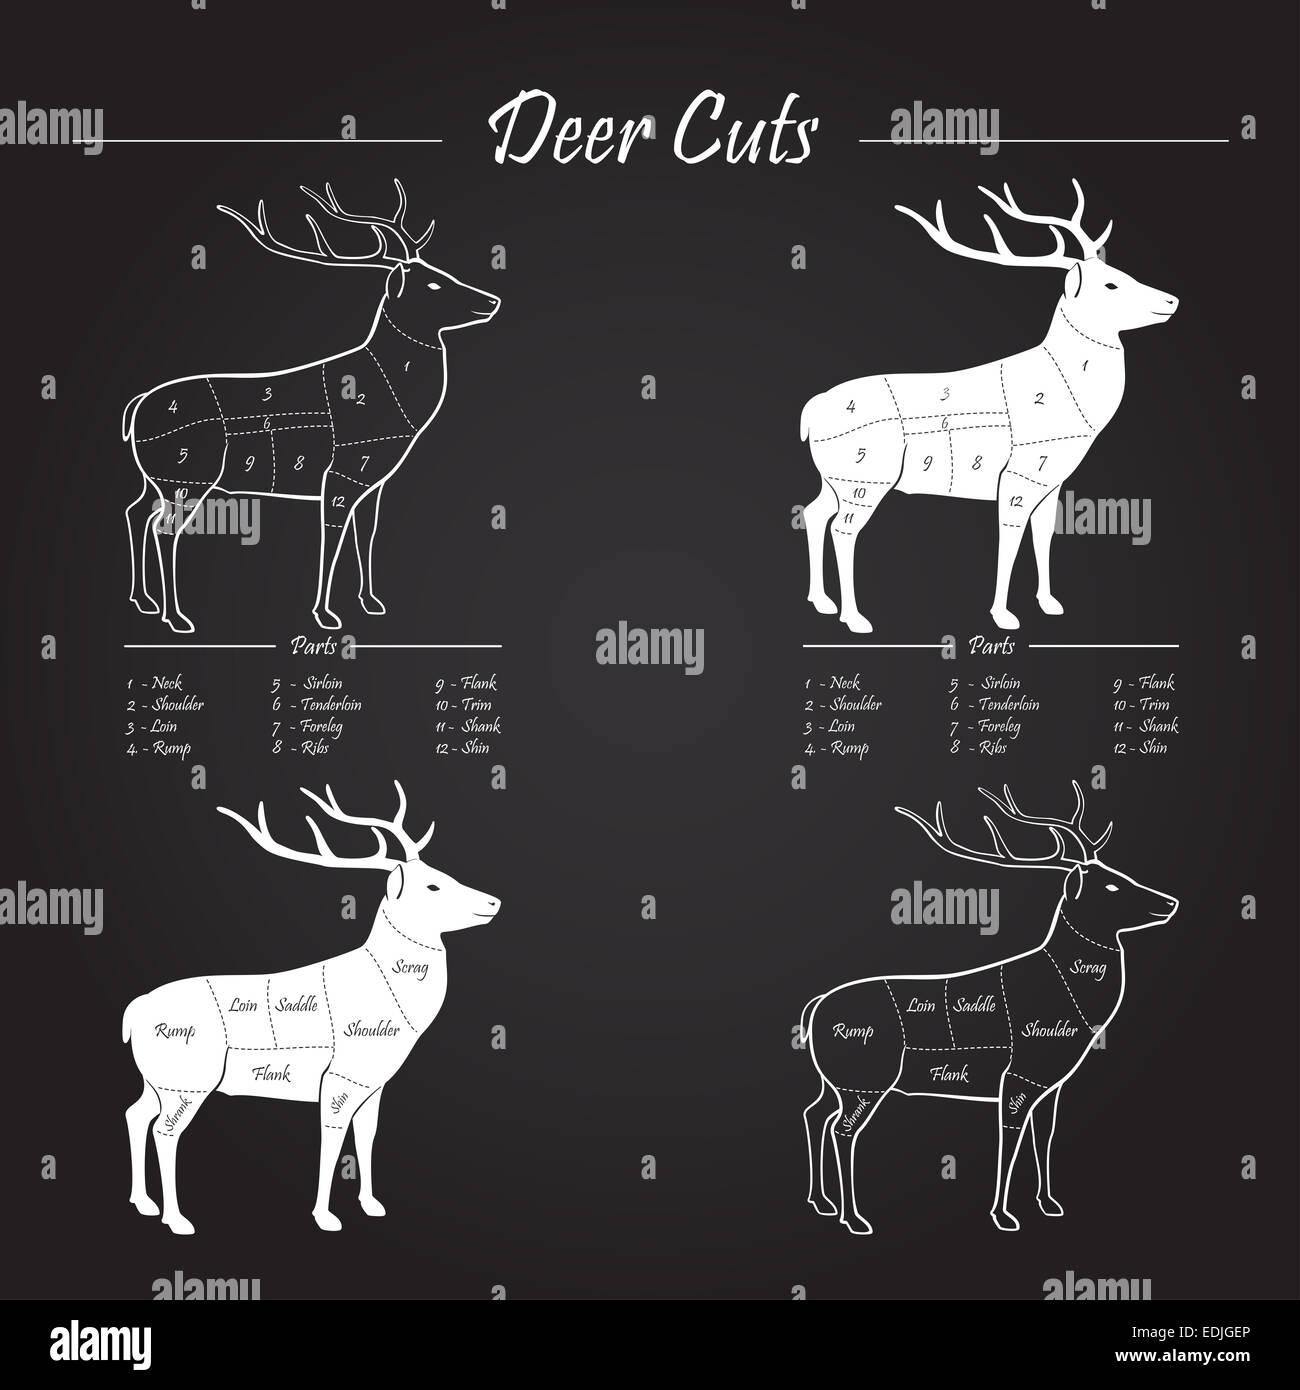 Phenomenal Deer Venison Meat Cut Diagram Sheme Elements On Chalkboard Stock Wiring 101 Cajosaxxcnl